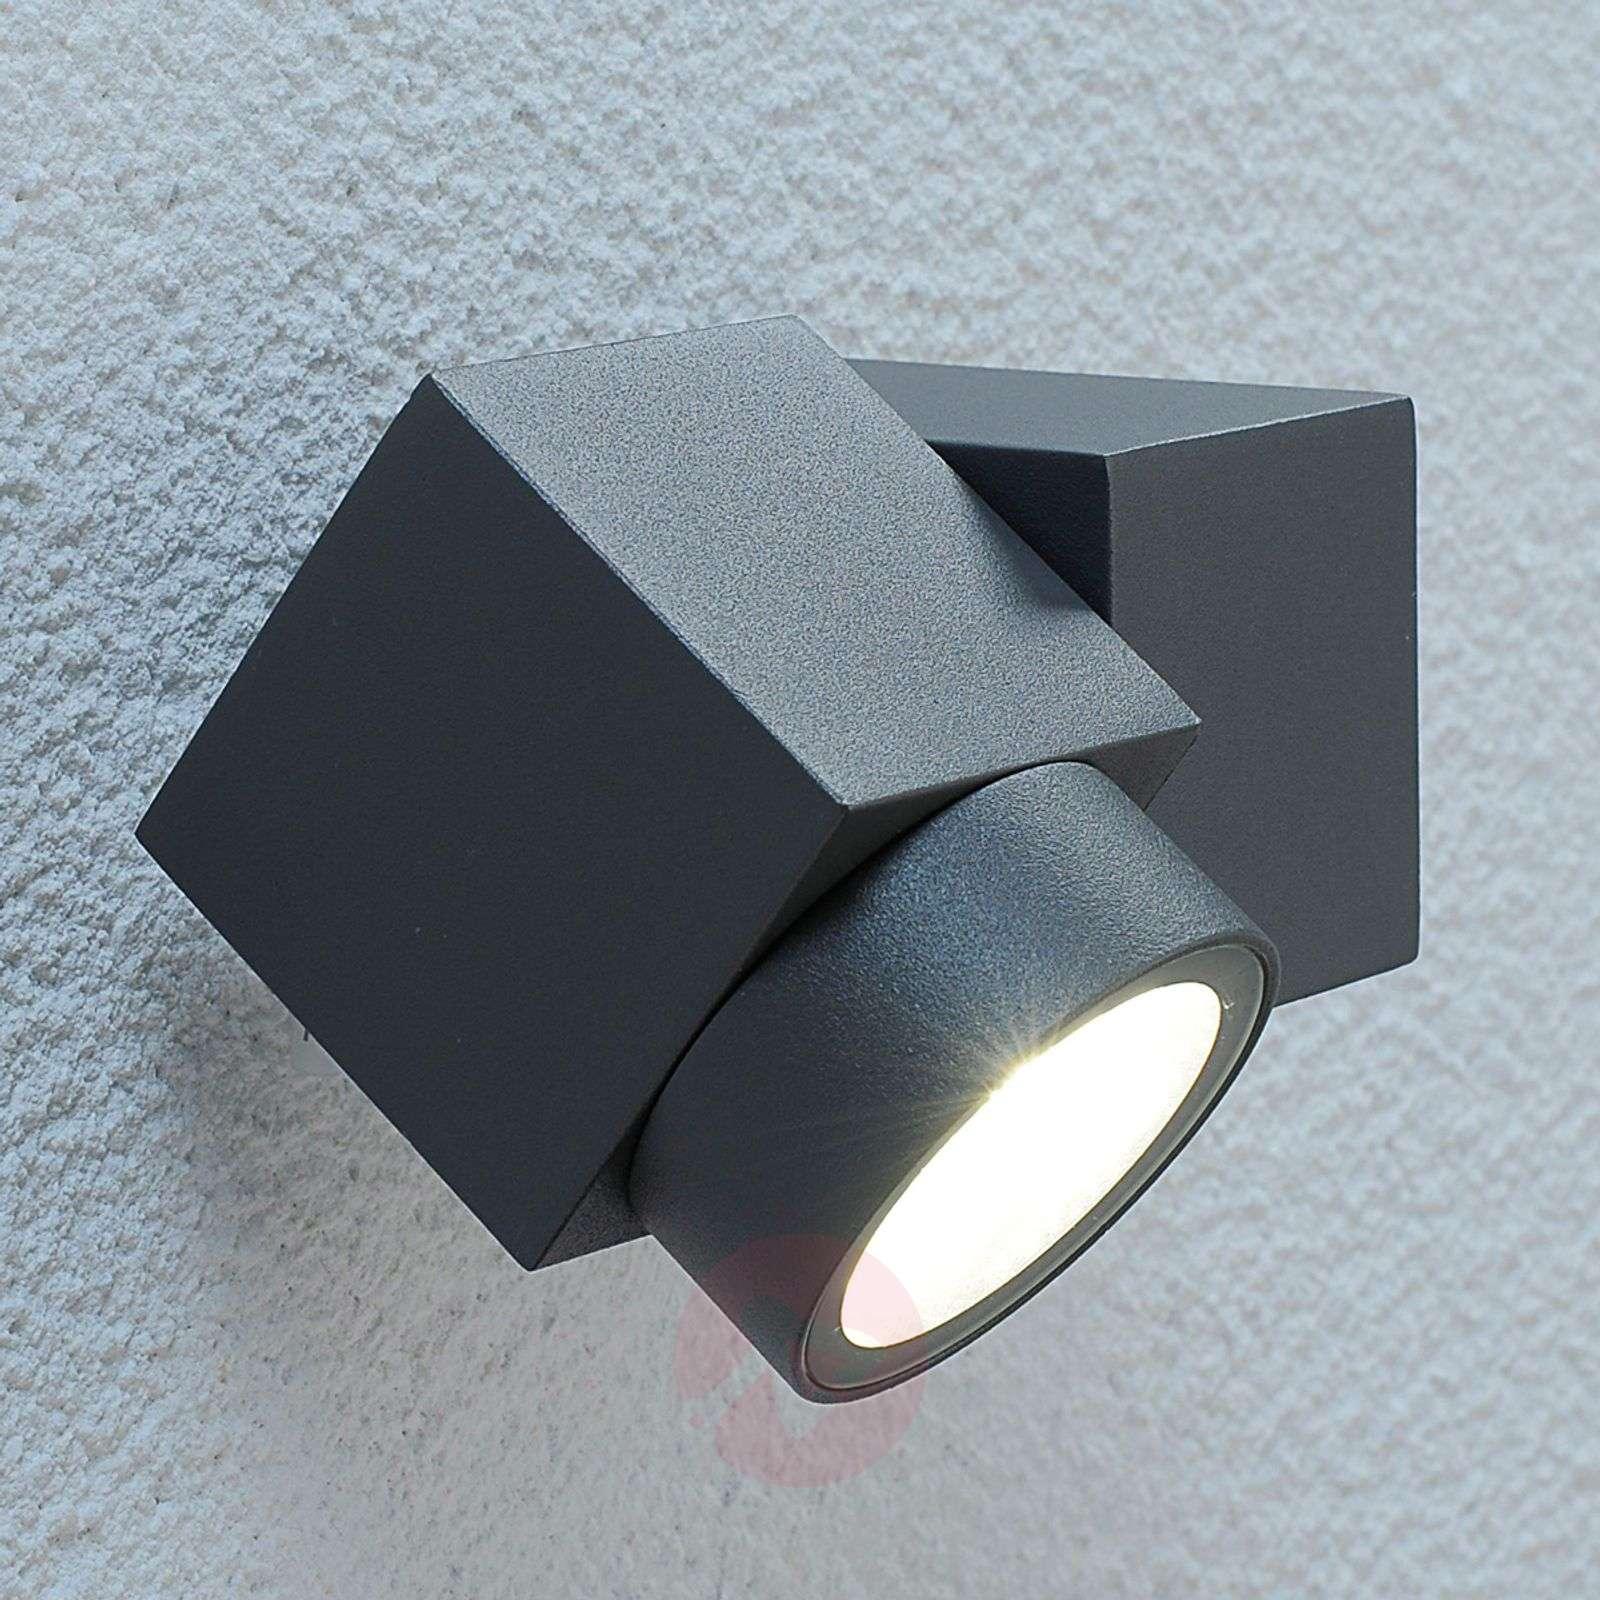 Outdoor Spot Light Adjustable led outdoor spotlight lorelle lights adjustable led outdoor spotlight lorelle 9618048 01 workwithnaturefo